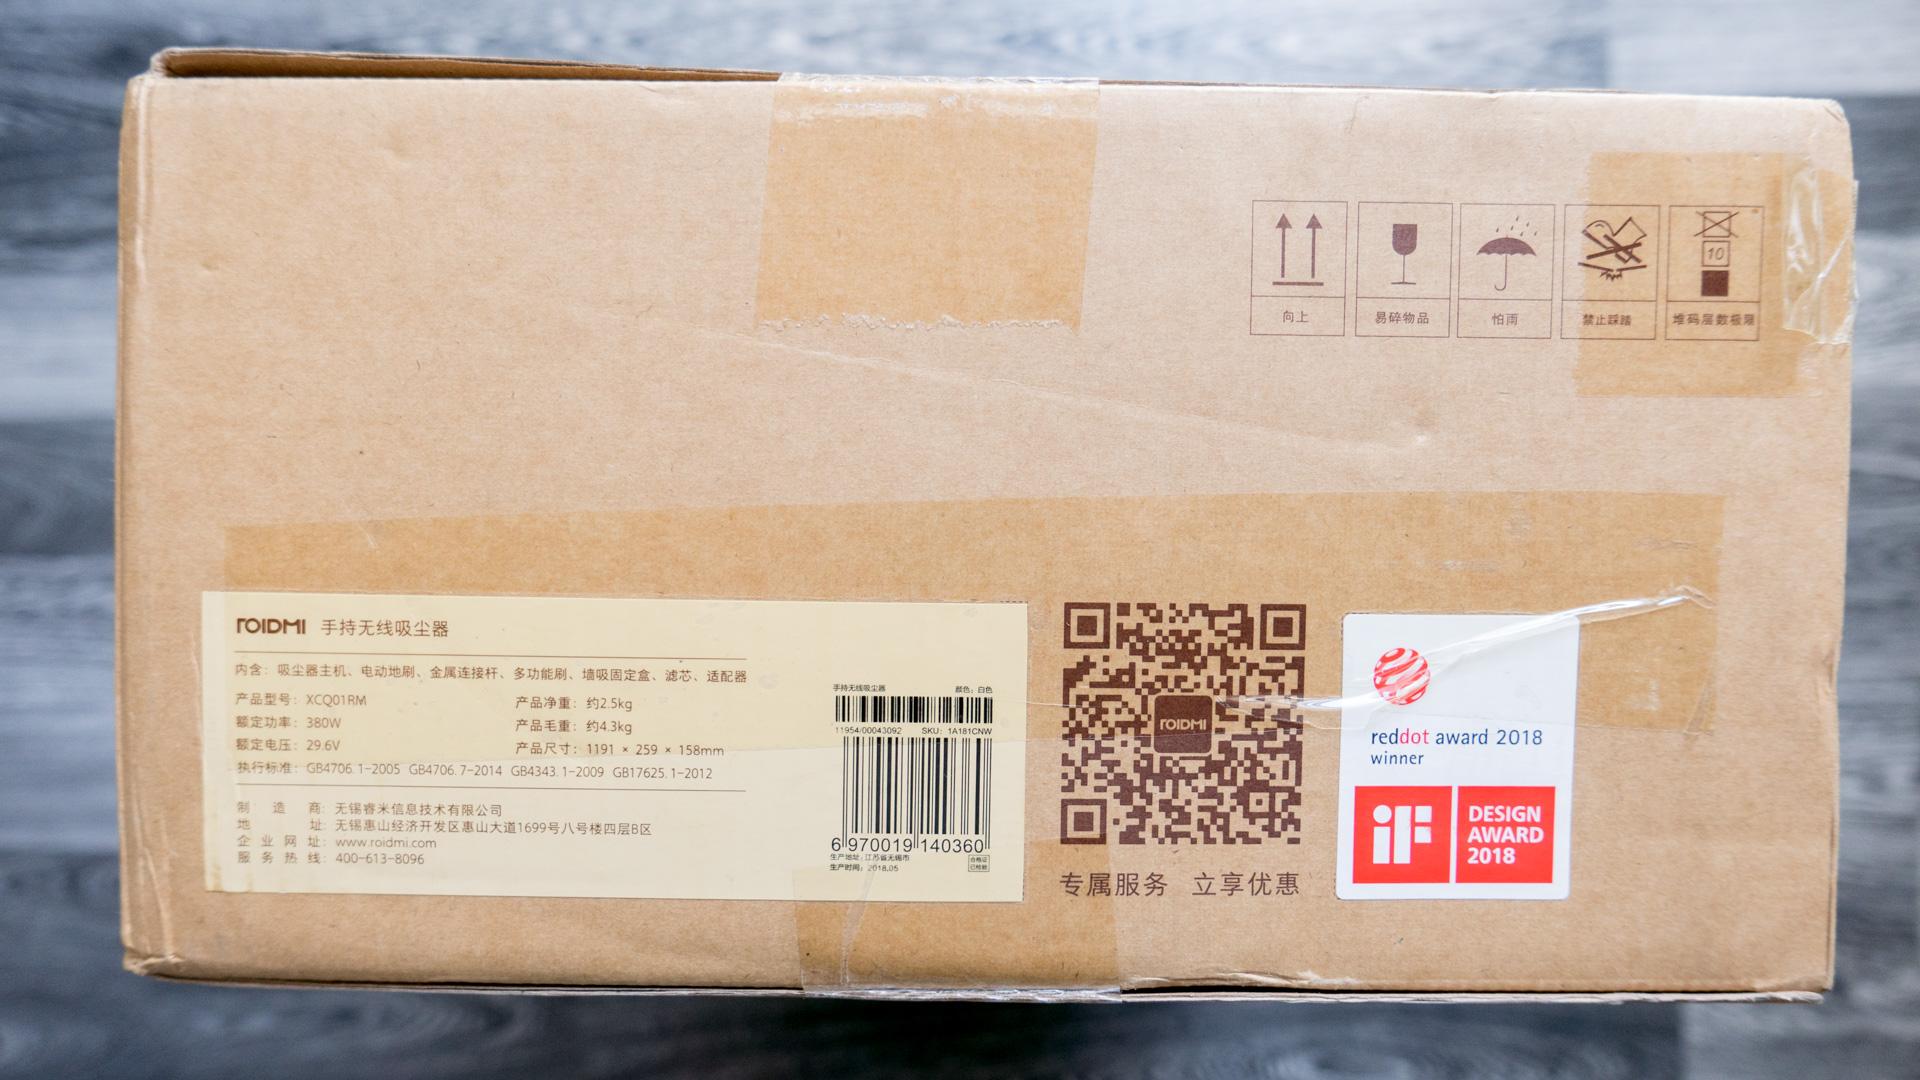 Xiaomi Roidmi Unboxing 03